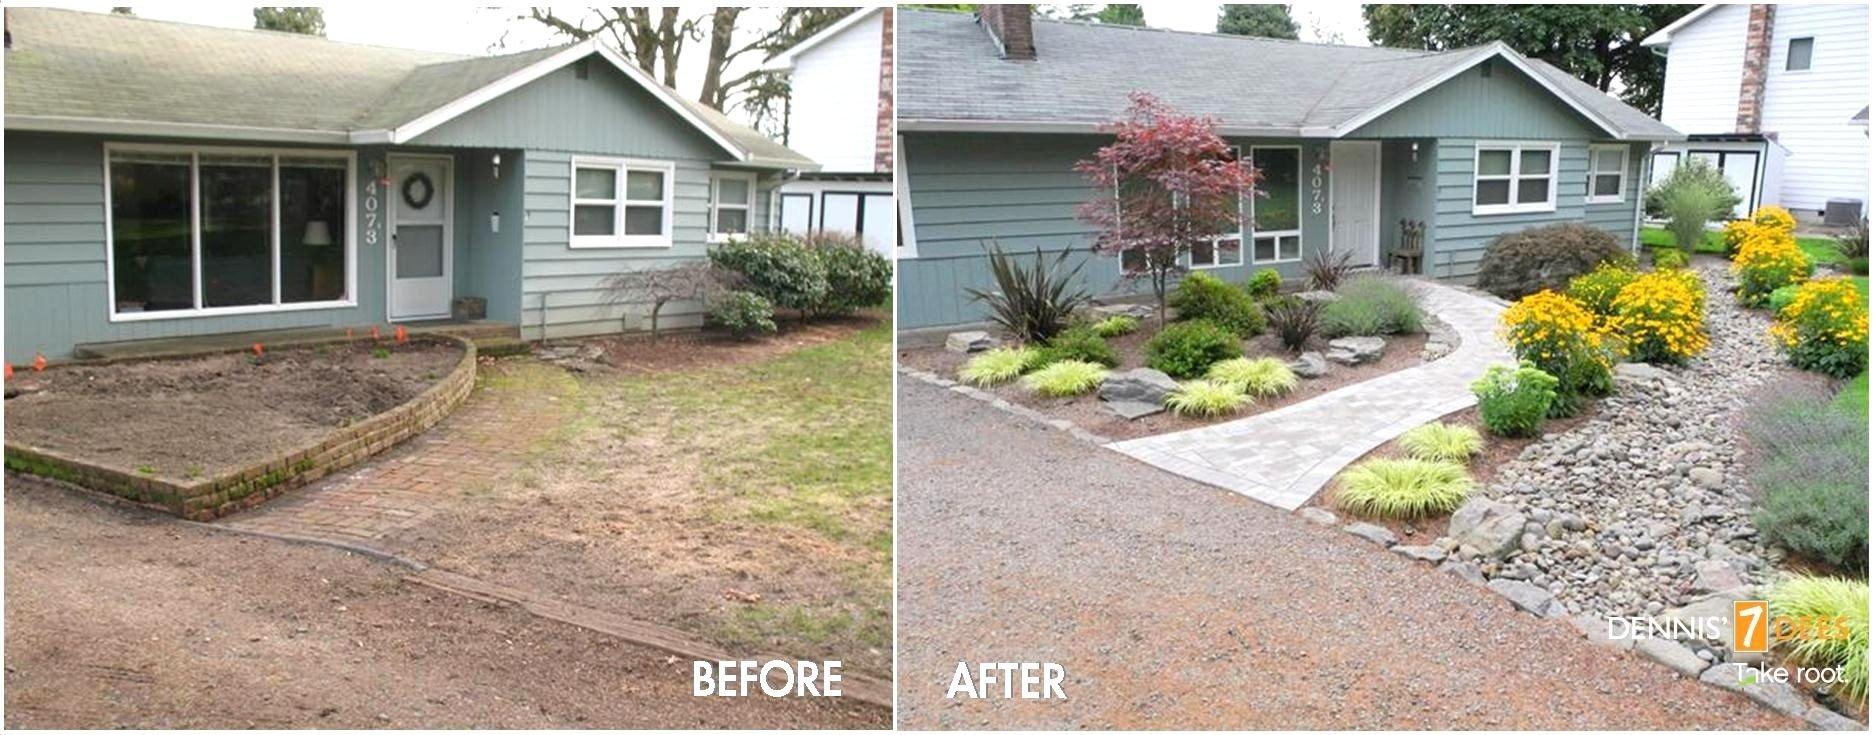 10 Unique Cheap Front Yard Landscaping Ideas economical front yard landscaping ideas the garden inspirations 2021